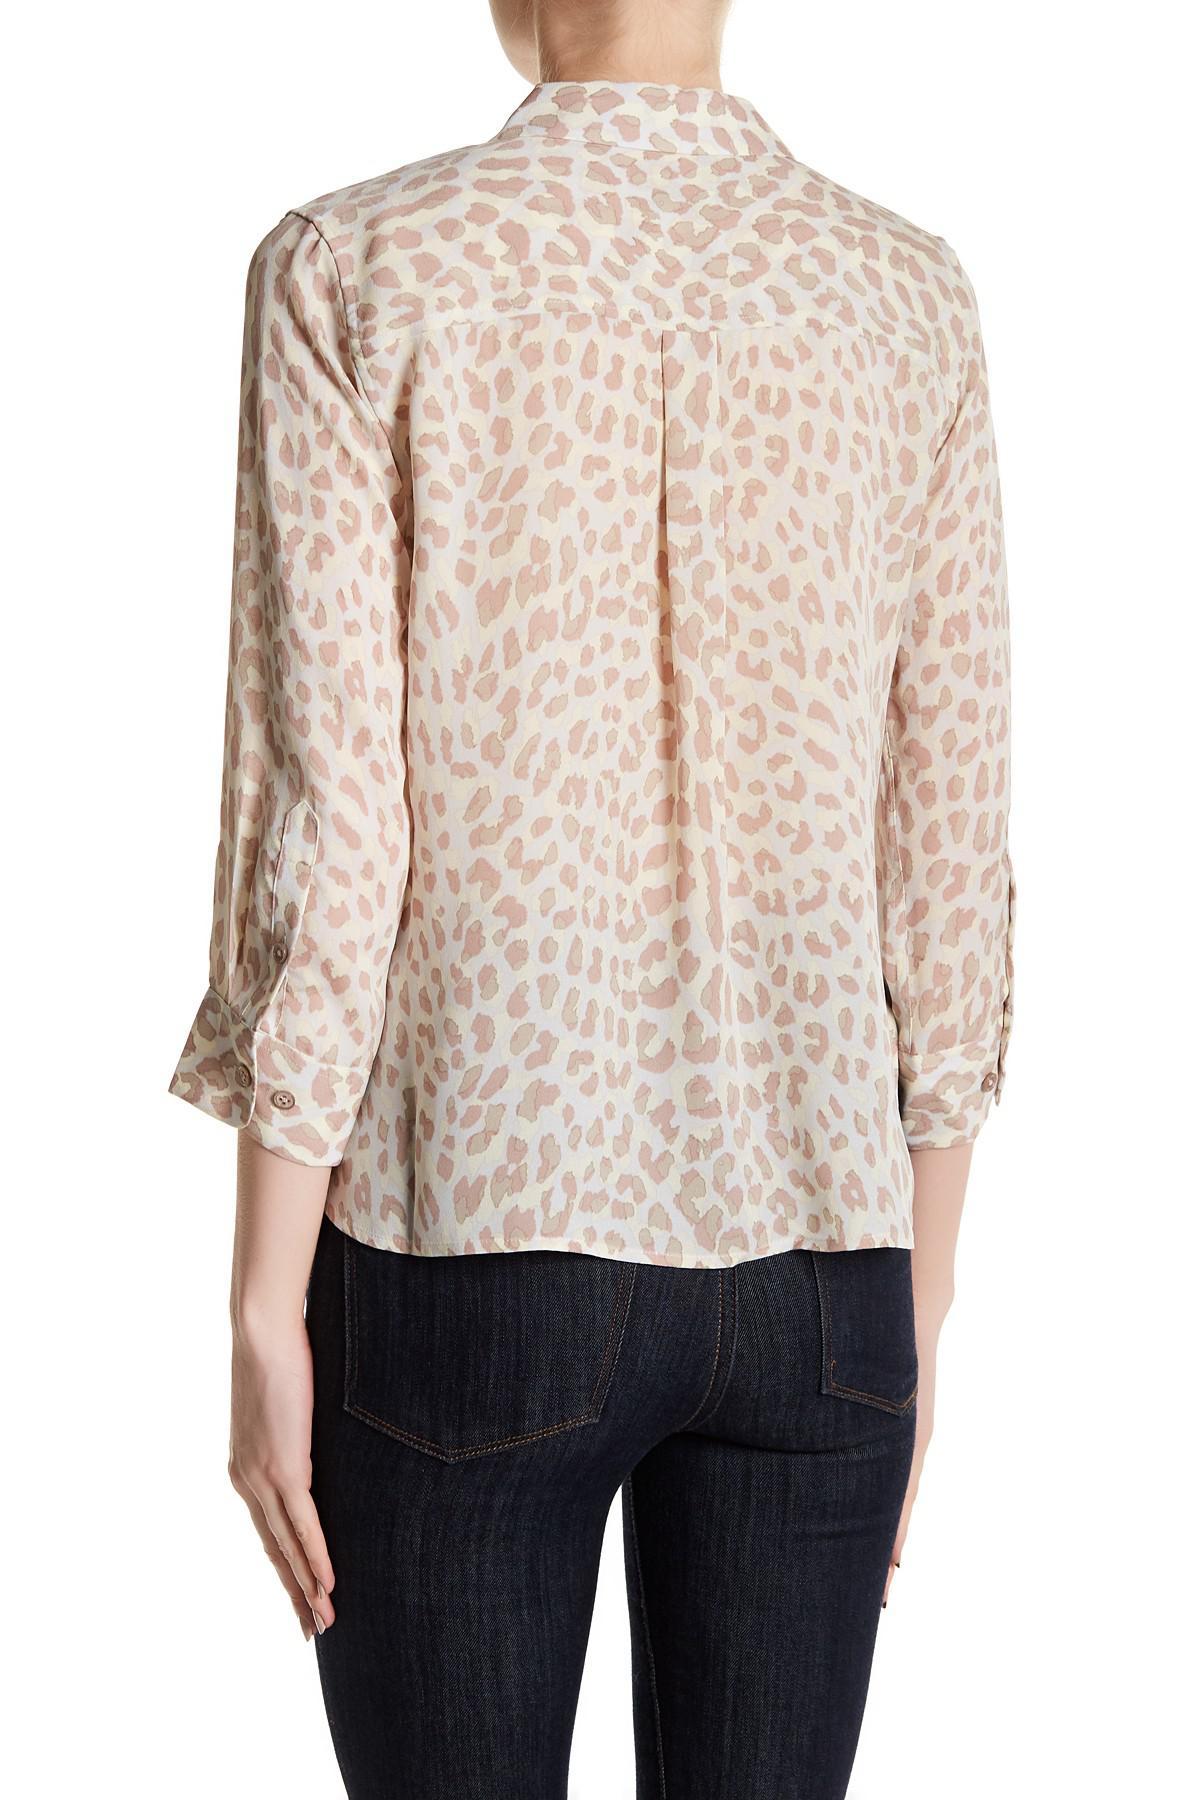 062c3752a0 Lyst - Equipment Signature Crop Leopard Print Silk Shirt